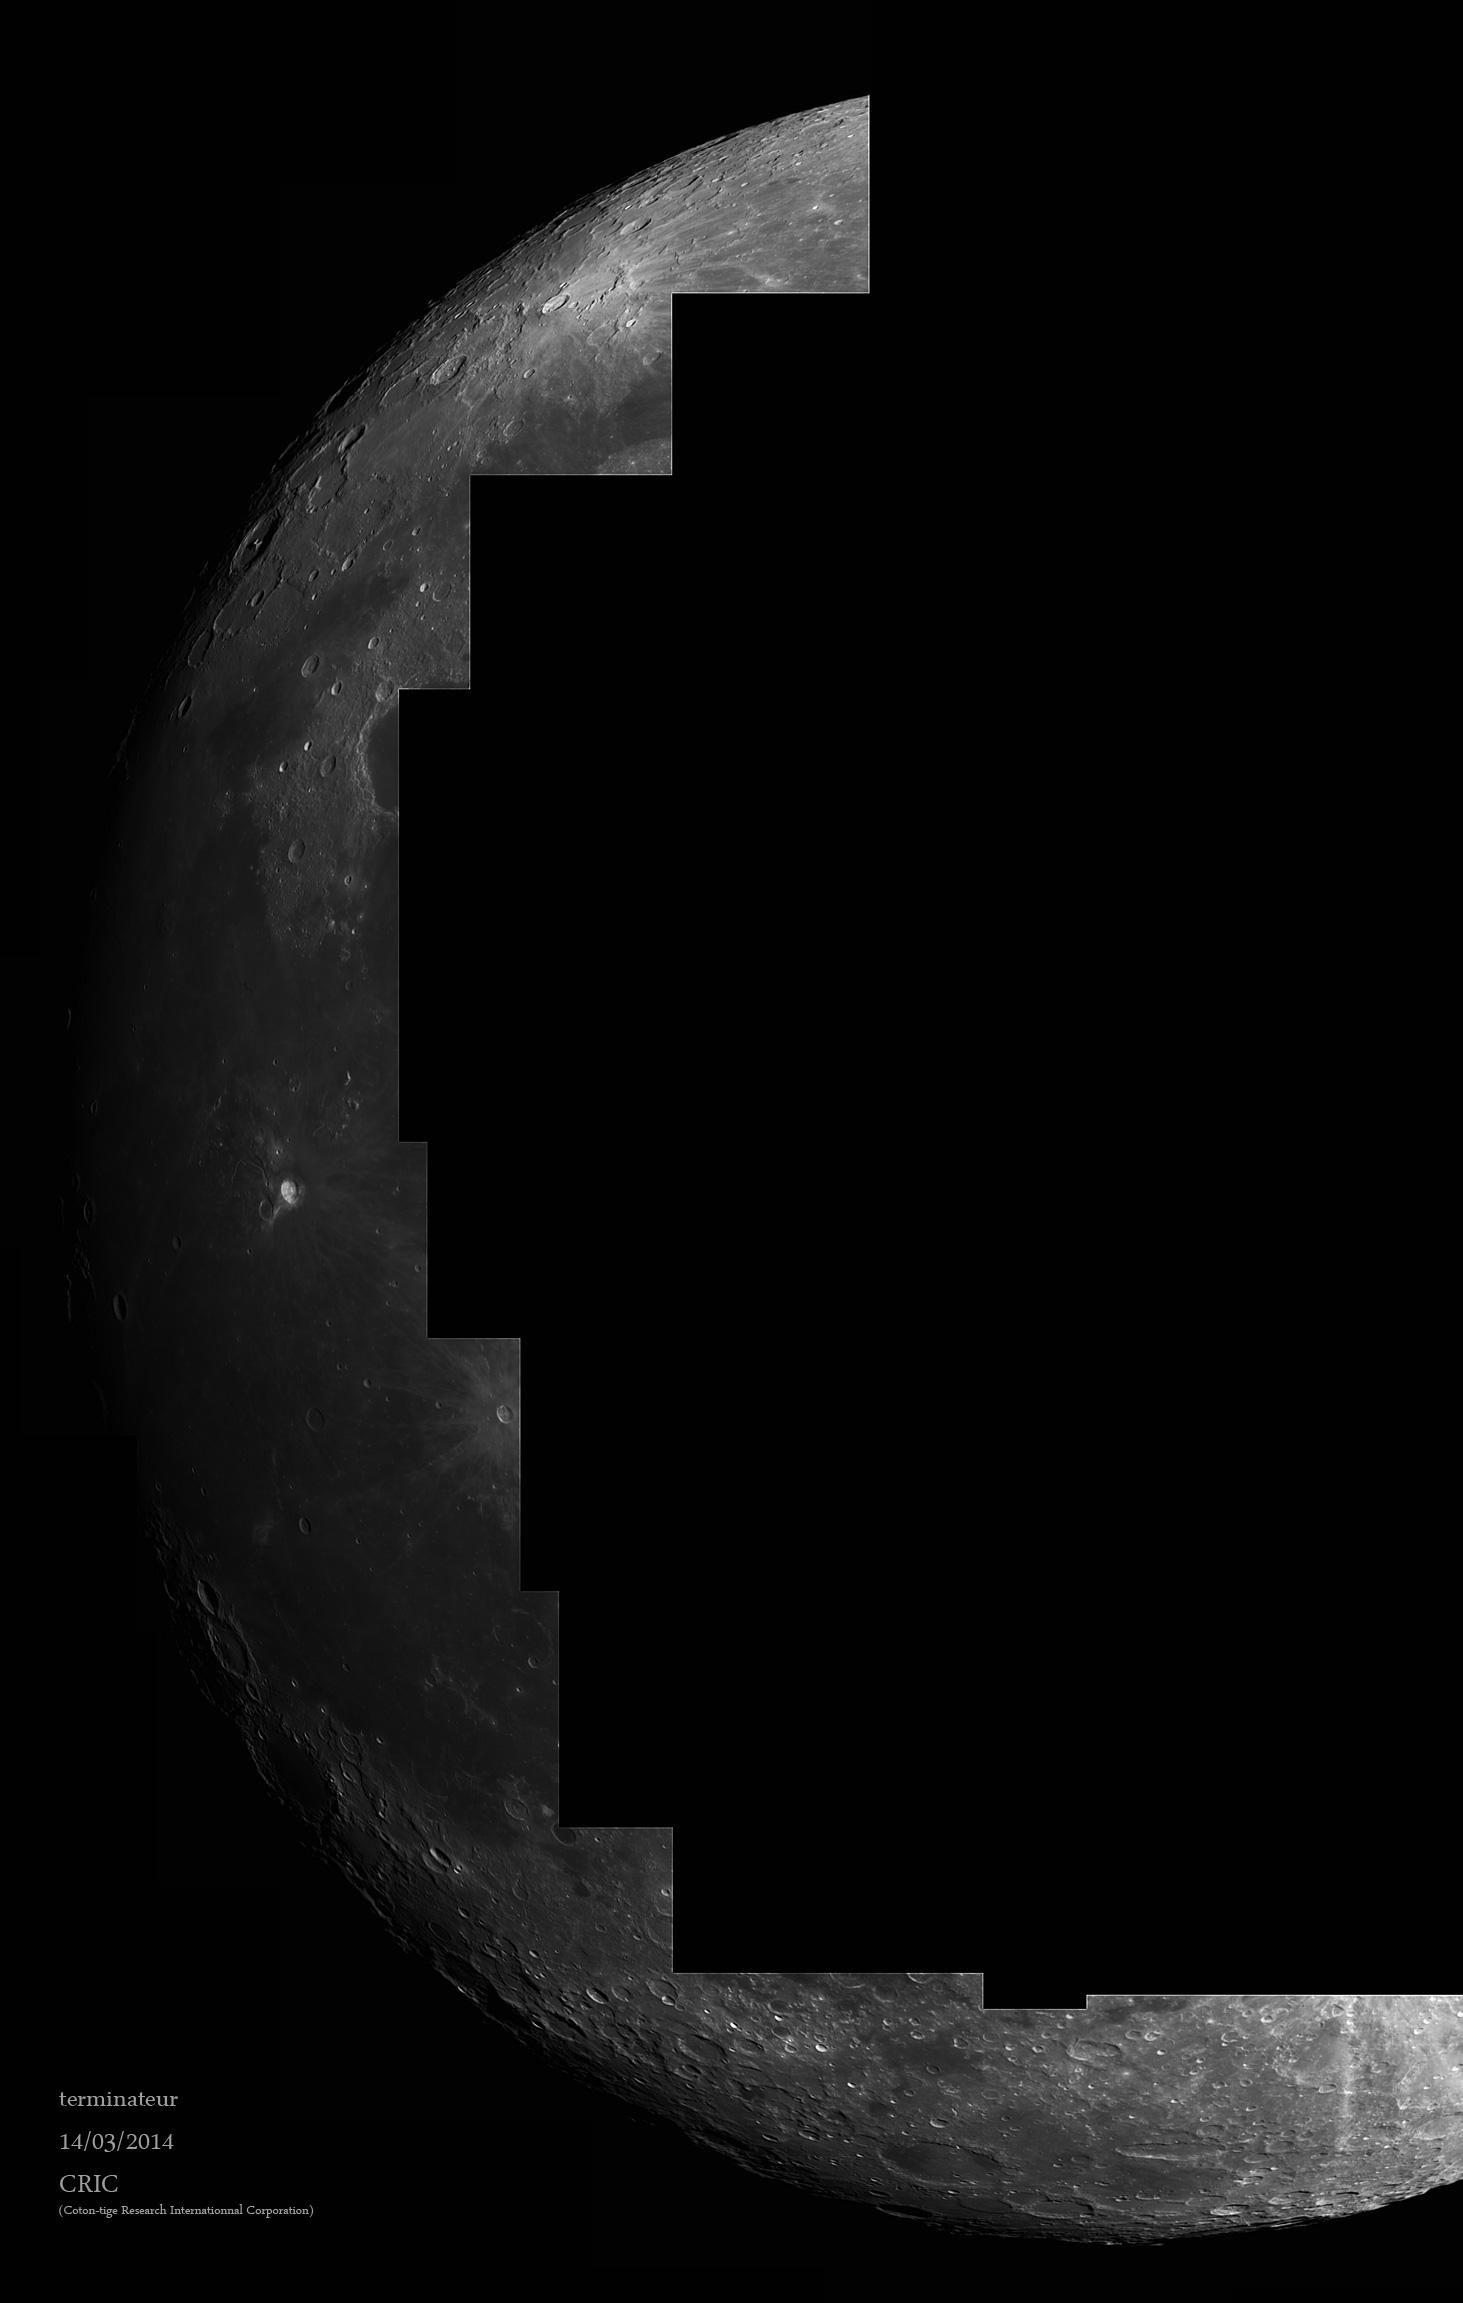 La Lune - Page 30 Mosa_14_3_2014reduite